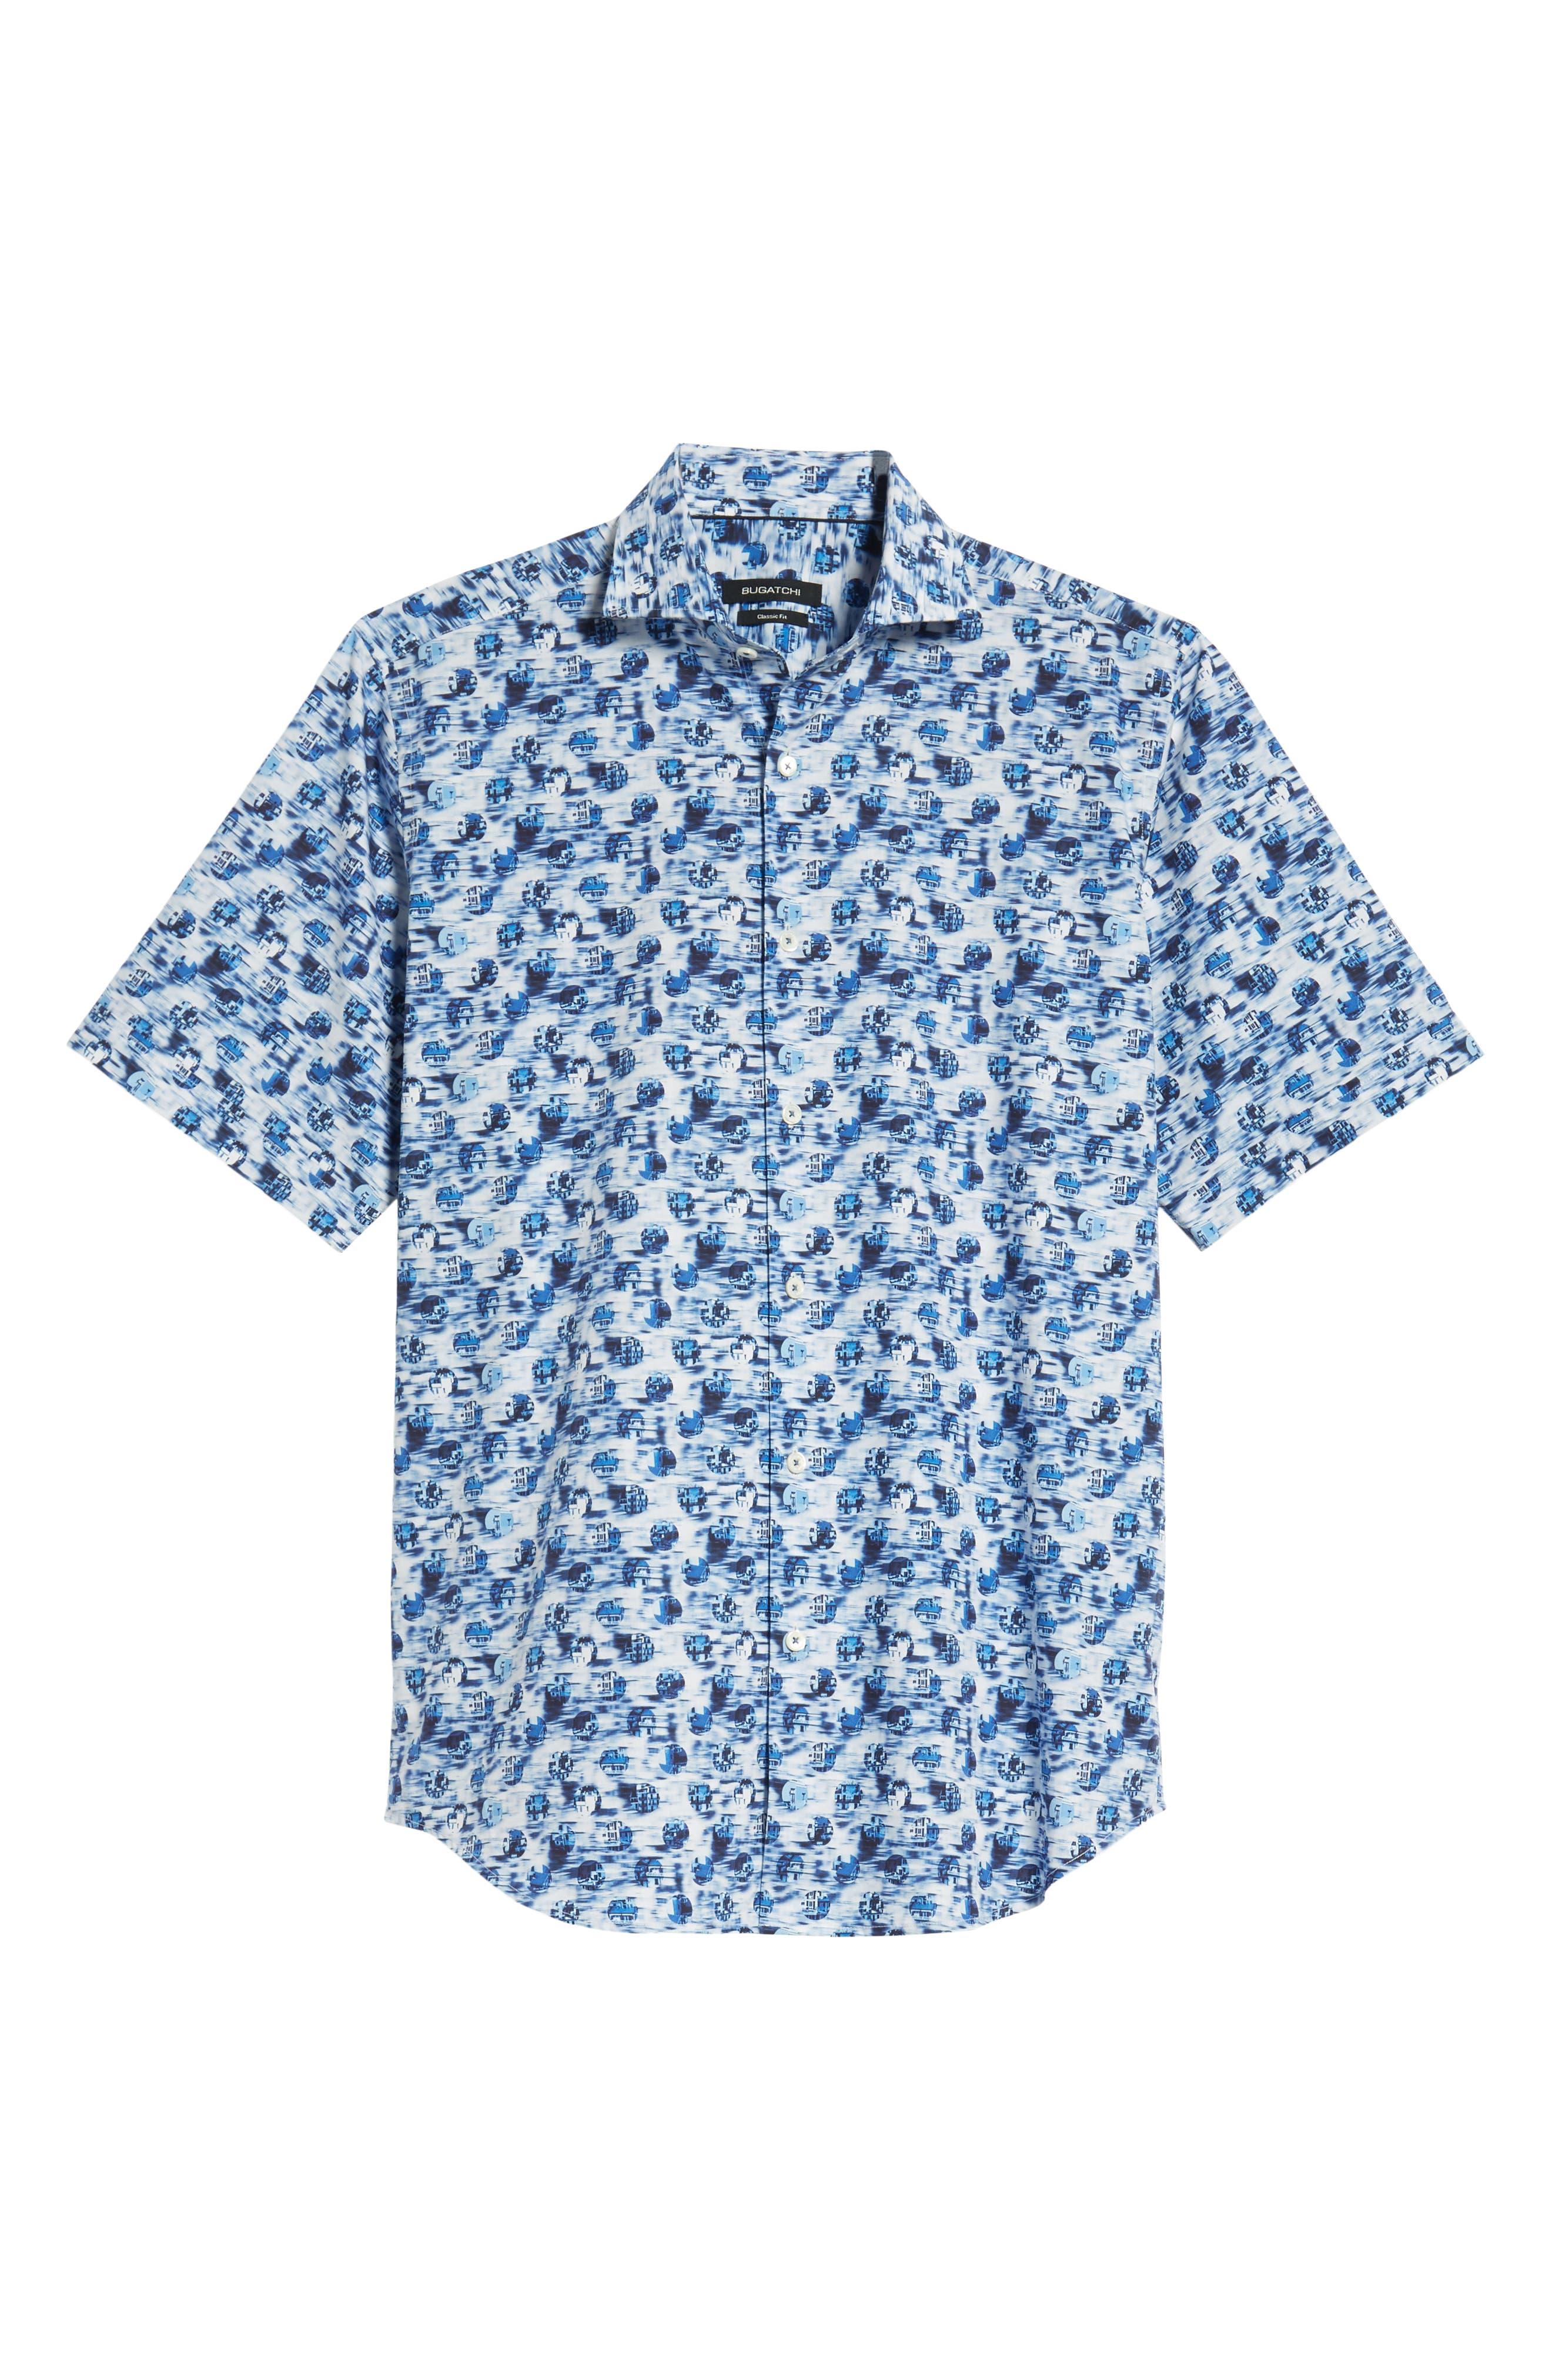 BUGATCHI,                             Classic Fit Print Sport Shirt,                             Alternate thumbnail 5, color,                             DUSTY BLUE